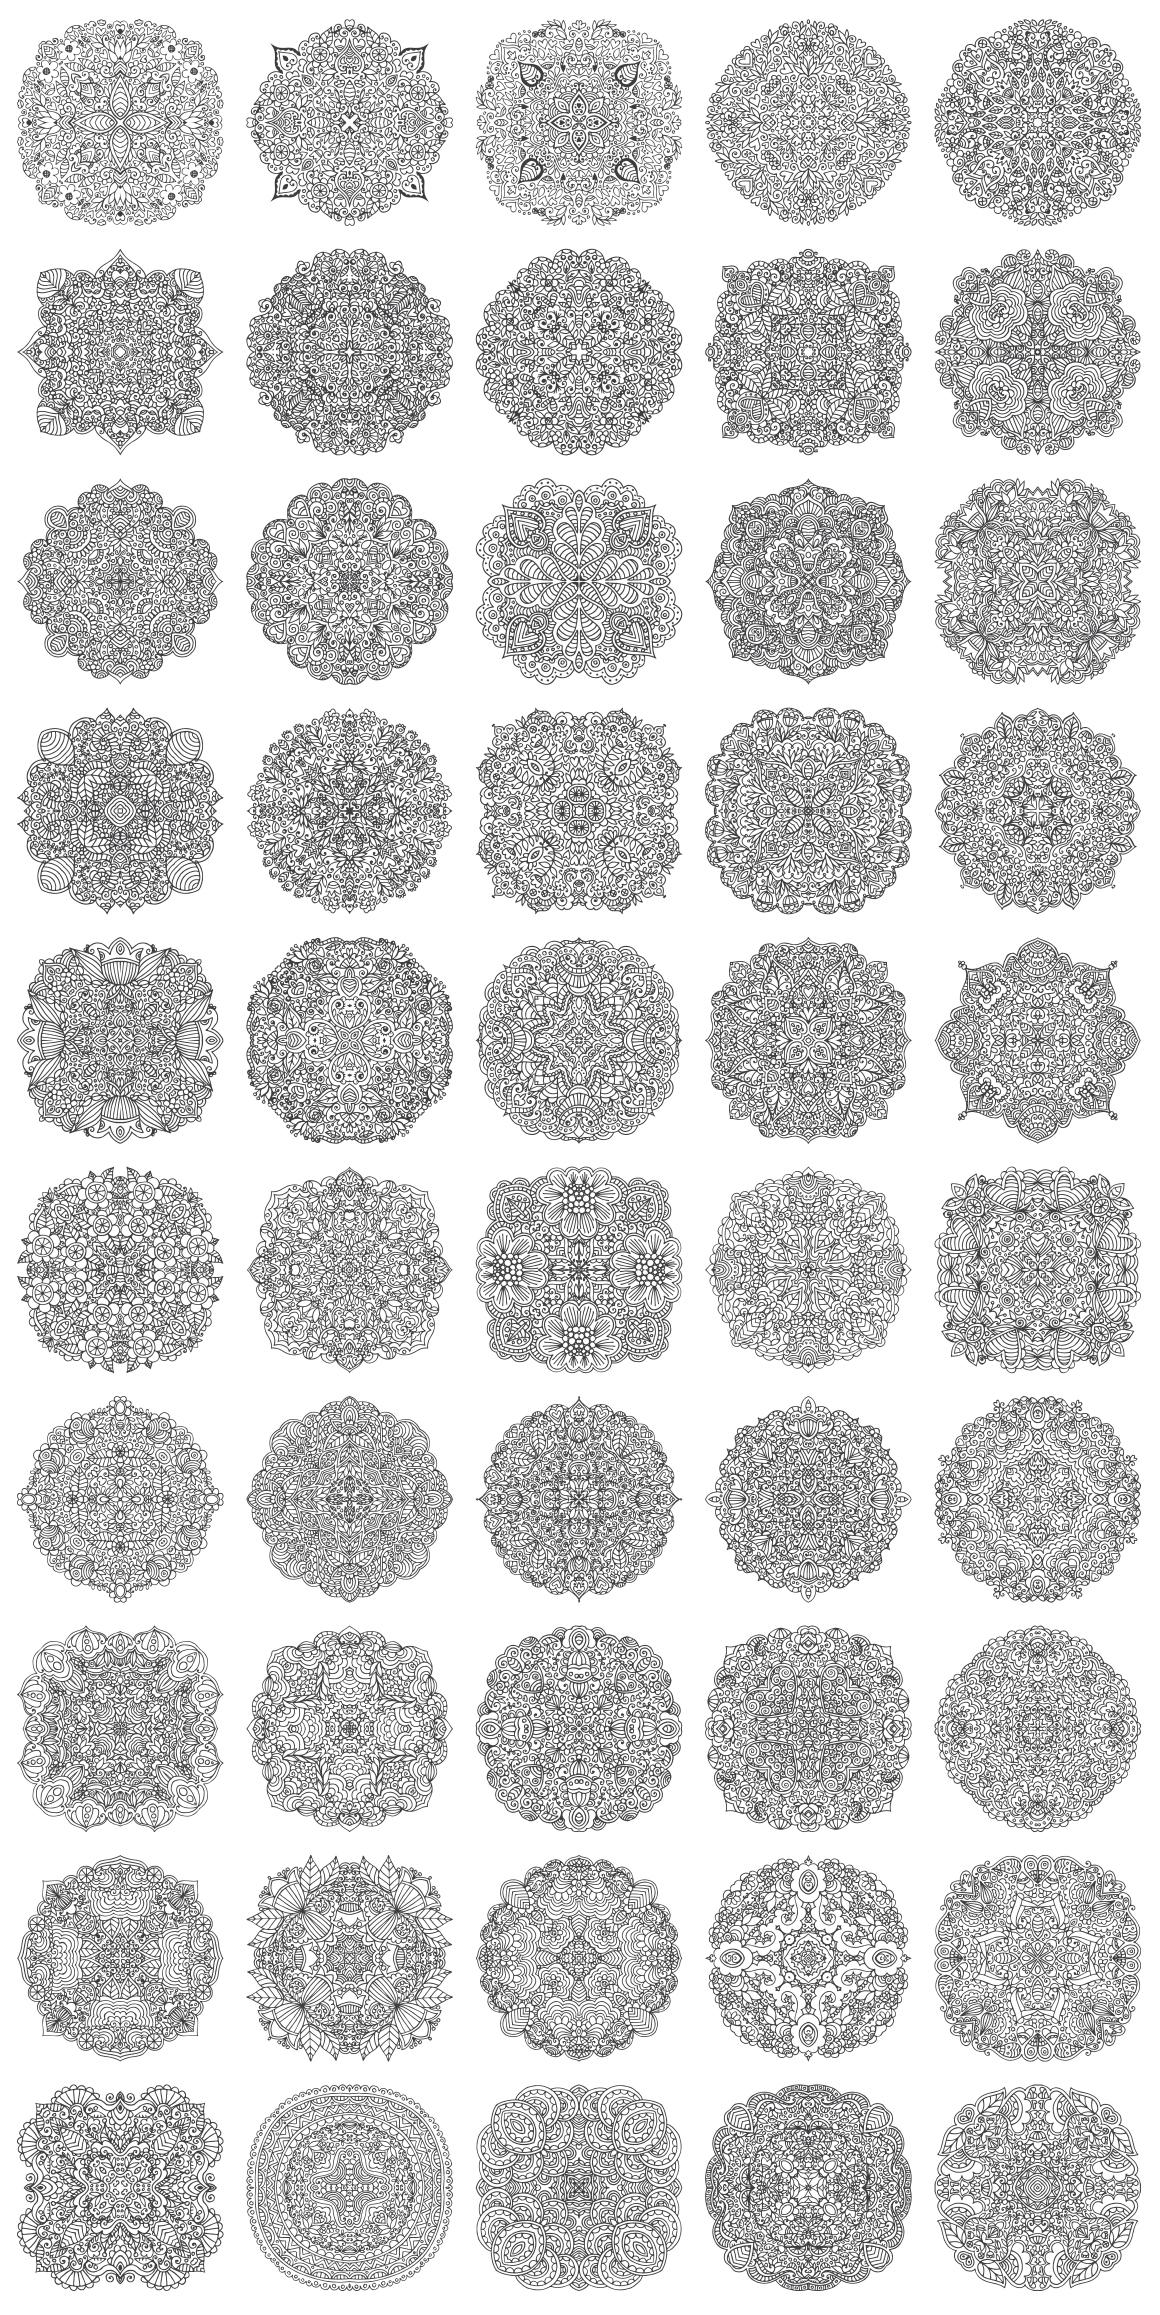 100 Vector Mandalas Round Ornaments example image 3